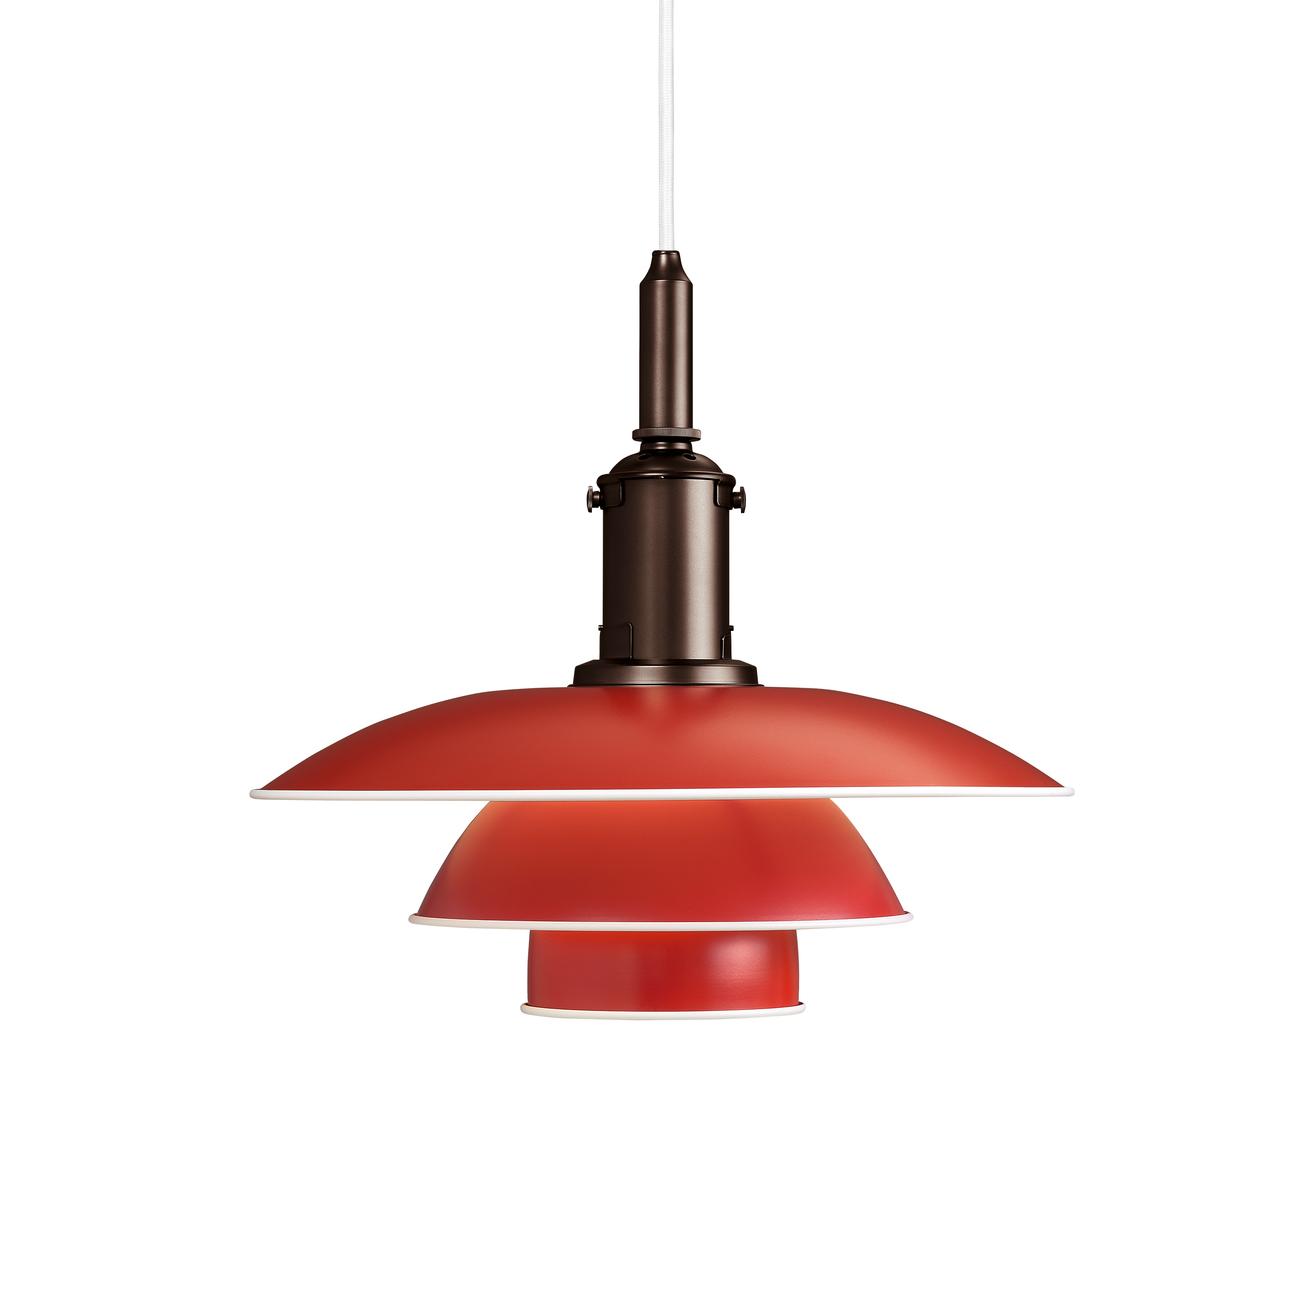 Louis Poulsen 3 1/2 - 3 Hanglamp-Rood